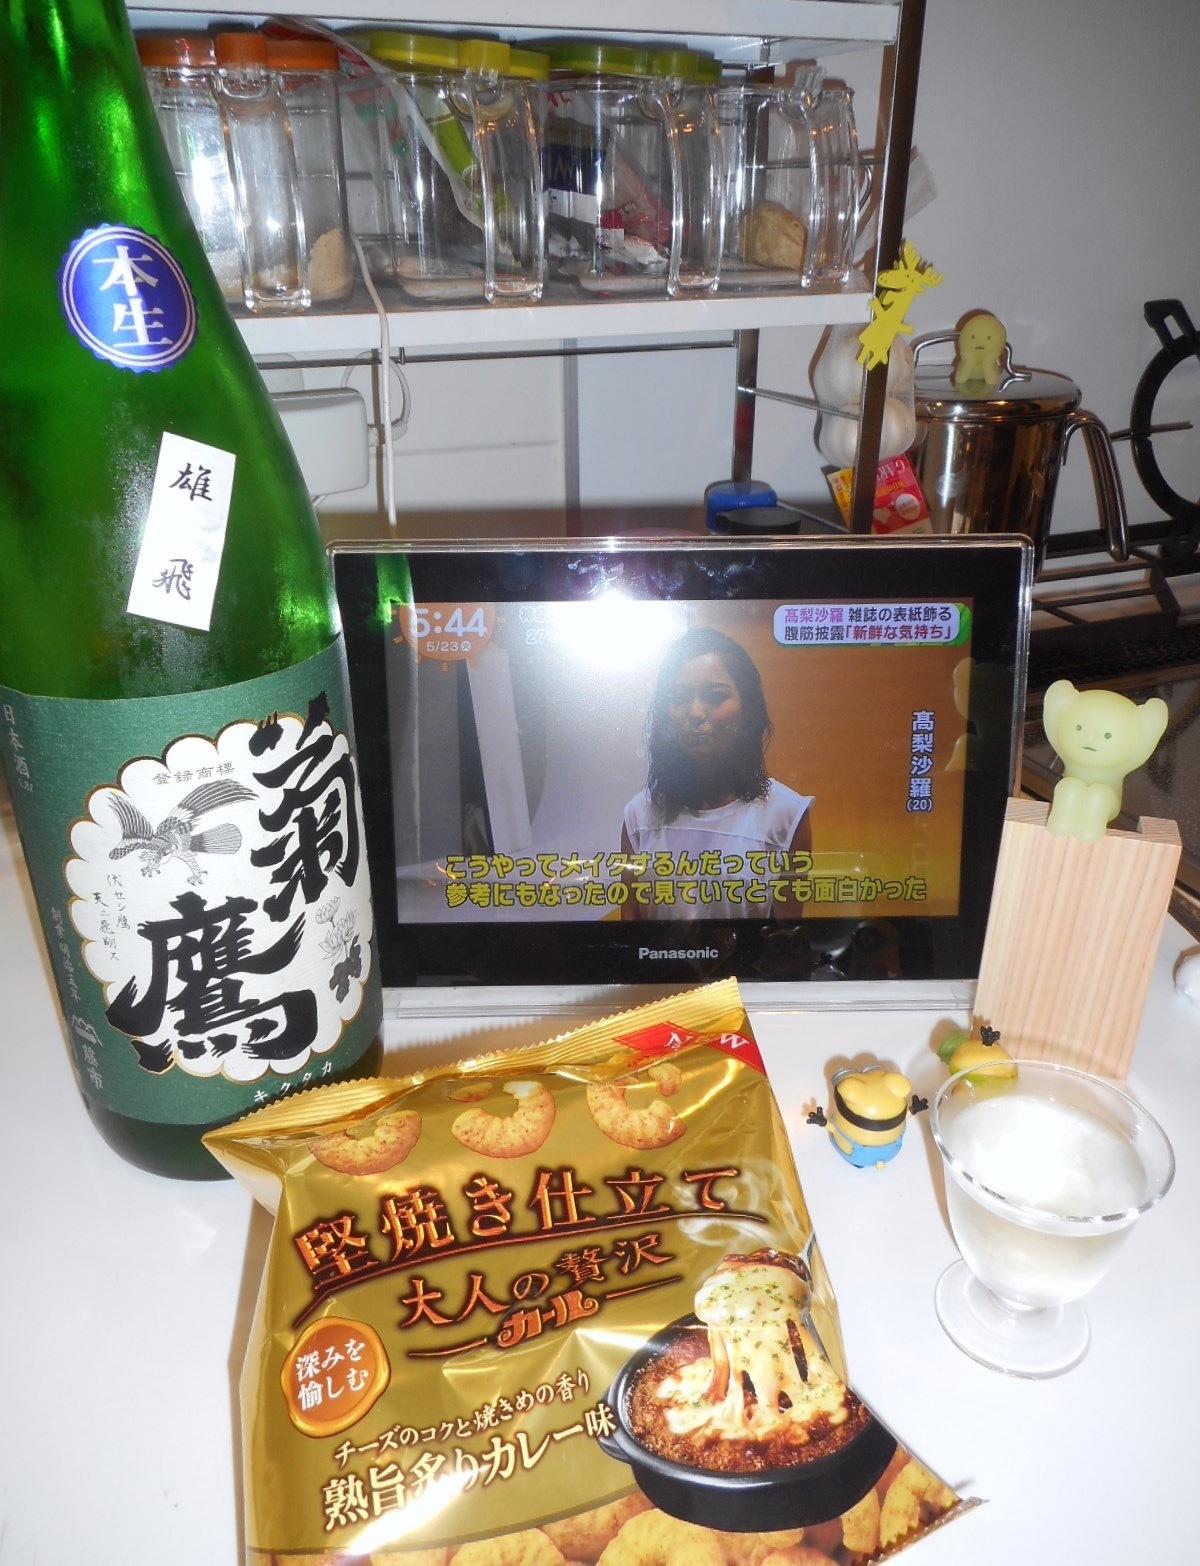 kikutaka_yuuhi_2nen_jukusei14.jpg